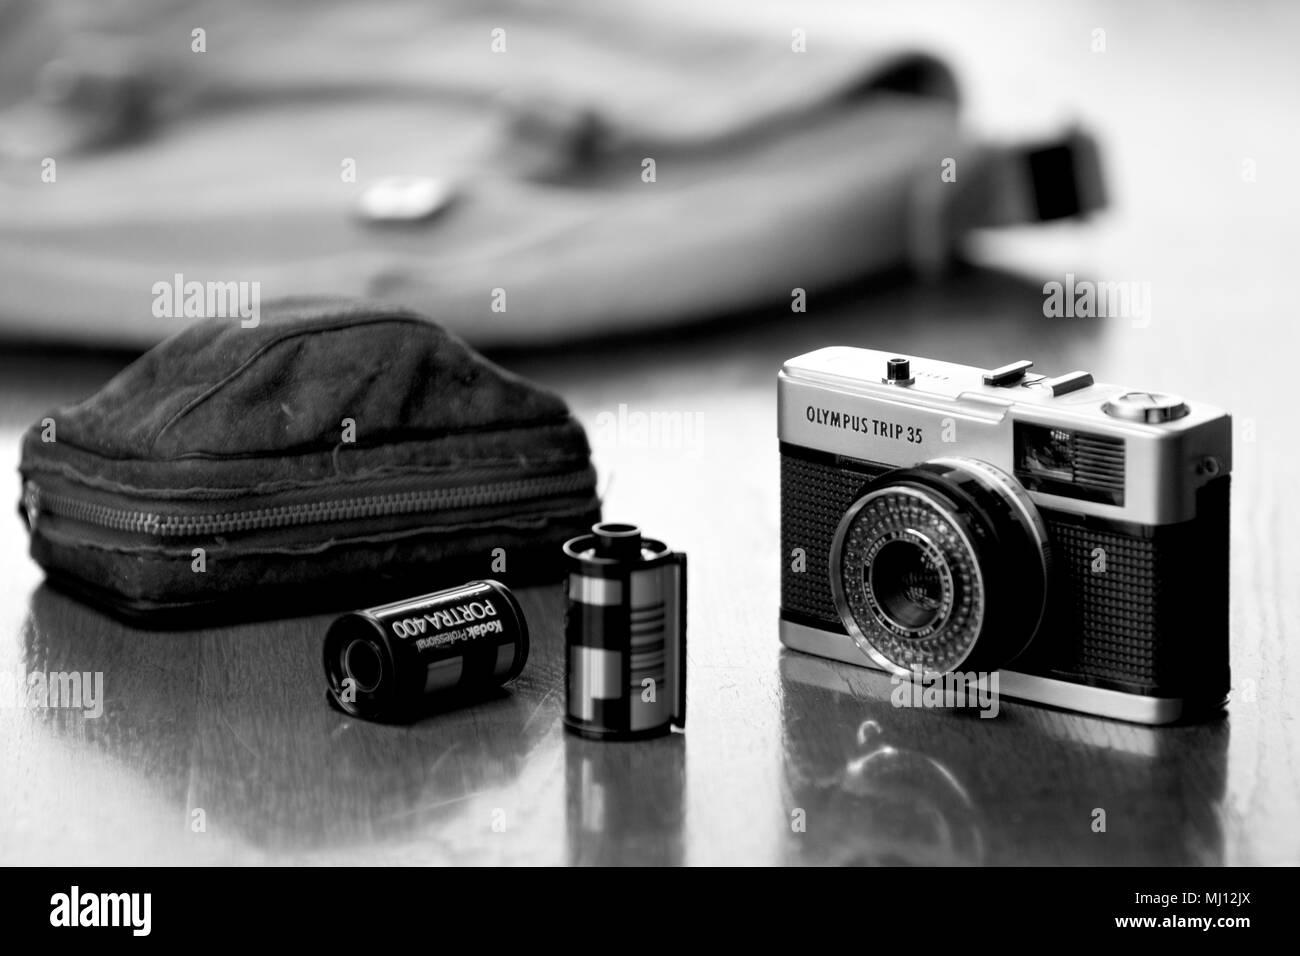 Olympus Trip 35mm compact film camera built between 1968 - 1983. - Stock Image